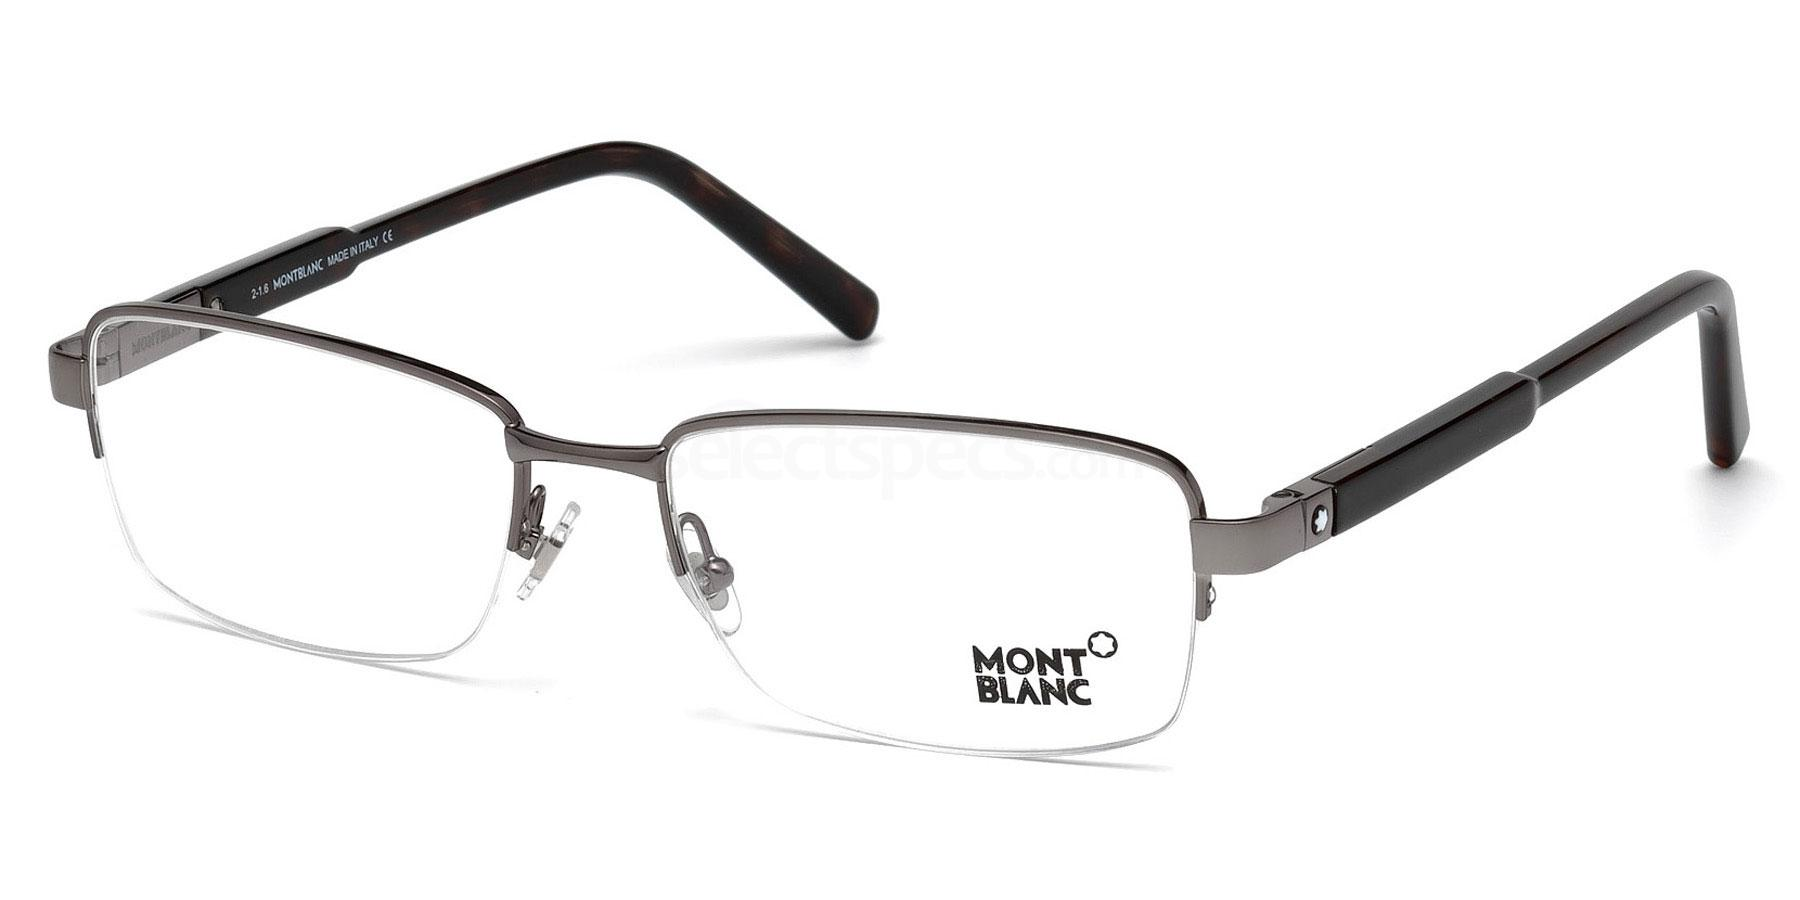 014 MB0635 Glasses, Mont Blanc